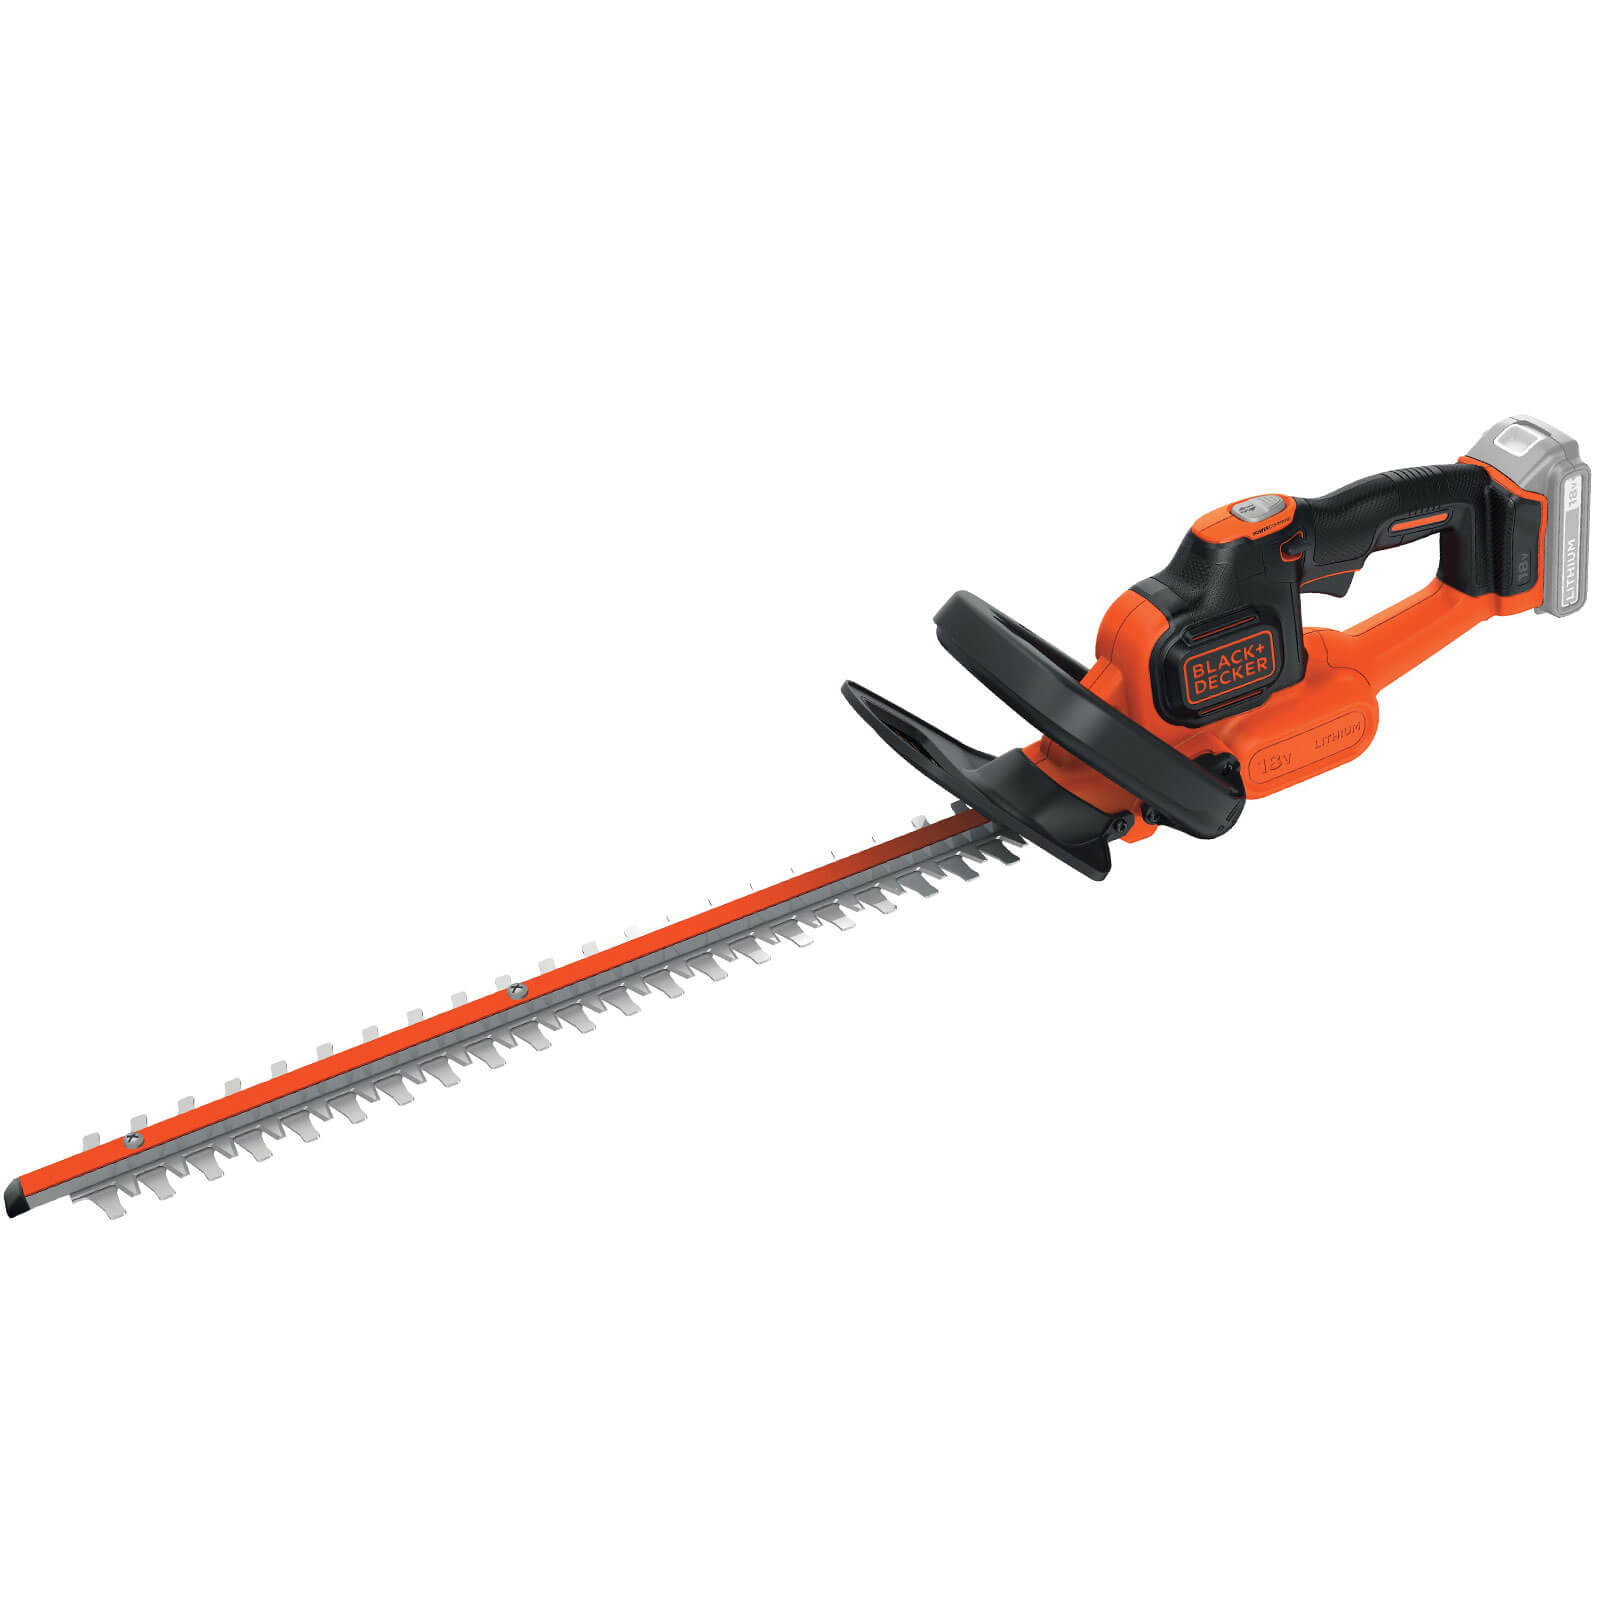 Image of Black & Decker GTC18452PC 18v Cordless Hedge Trimmer 450mm No Batteries No Charger